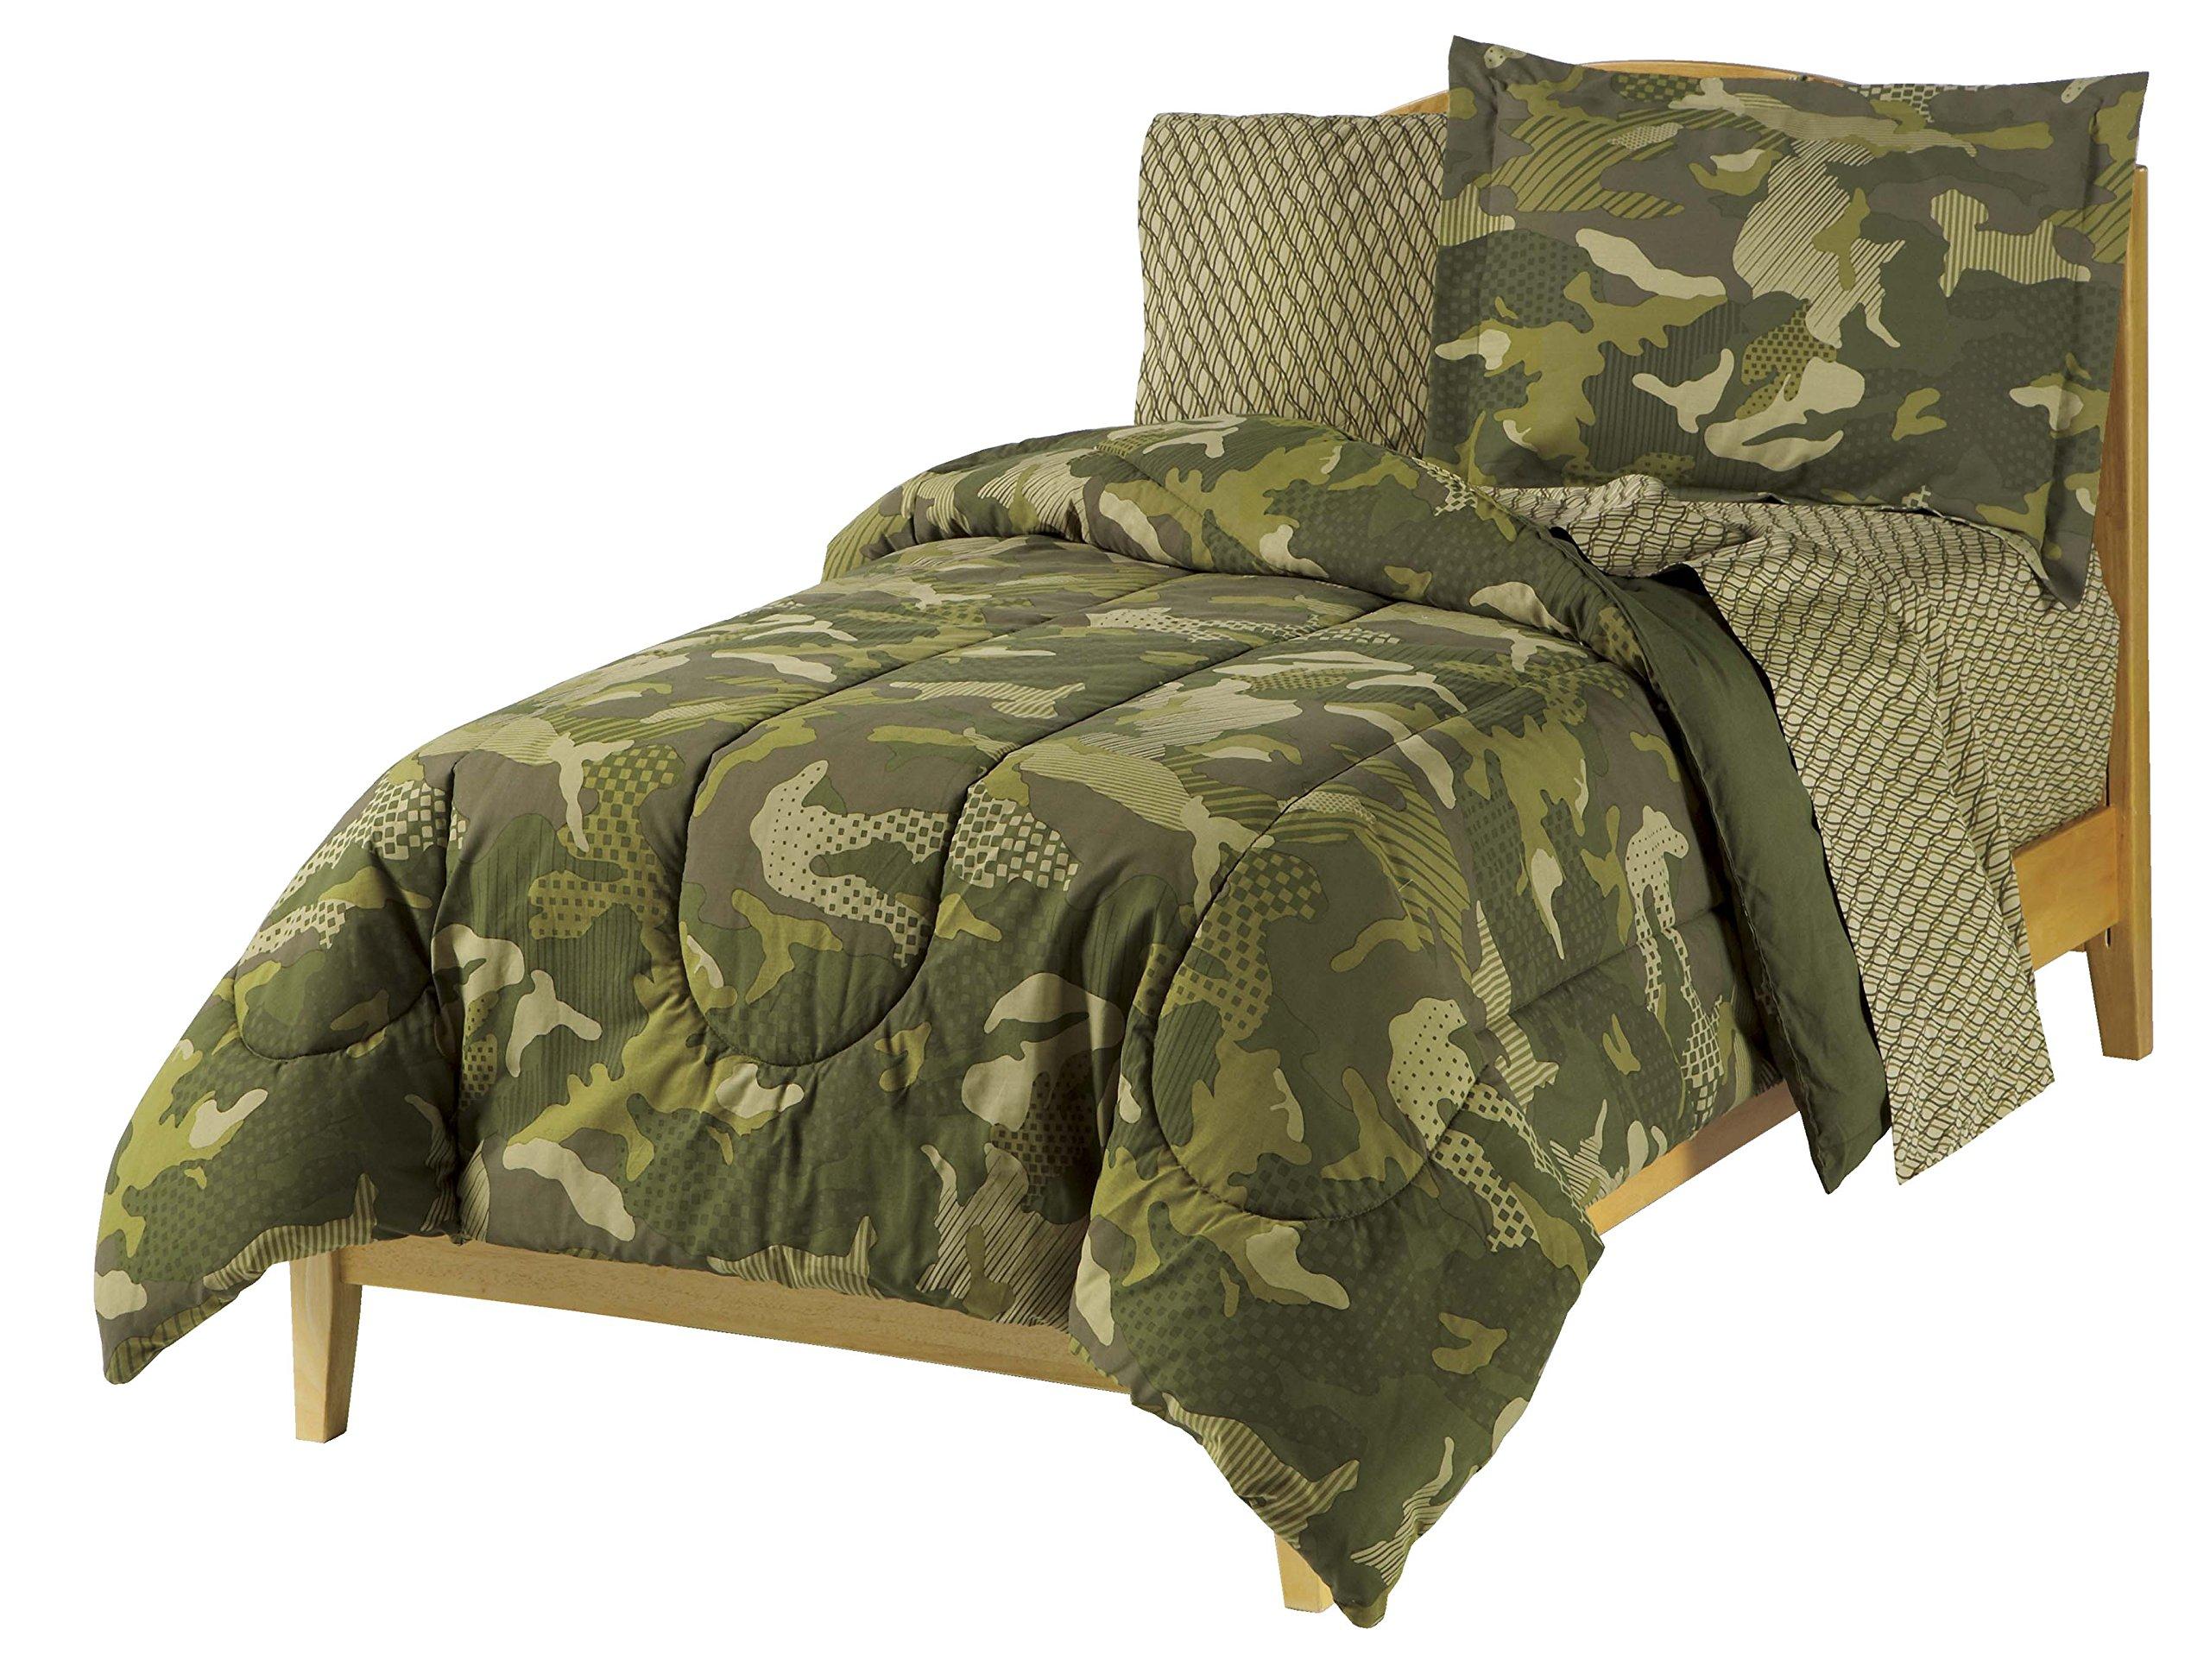 images walmart duck camouflage joggers glamorous leggings code camofire jacket living salt livingroom bedroom camo outfit brilliant ideas decor hm coupon room kuiu crocs